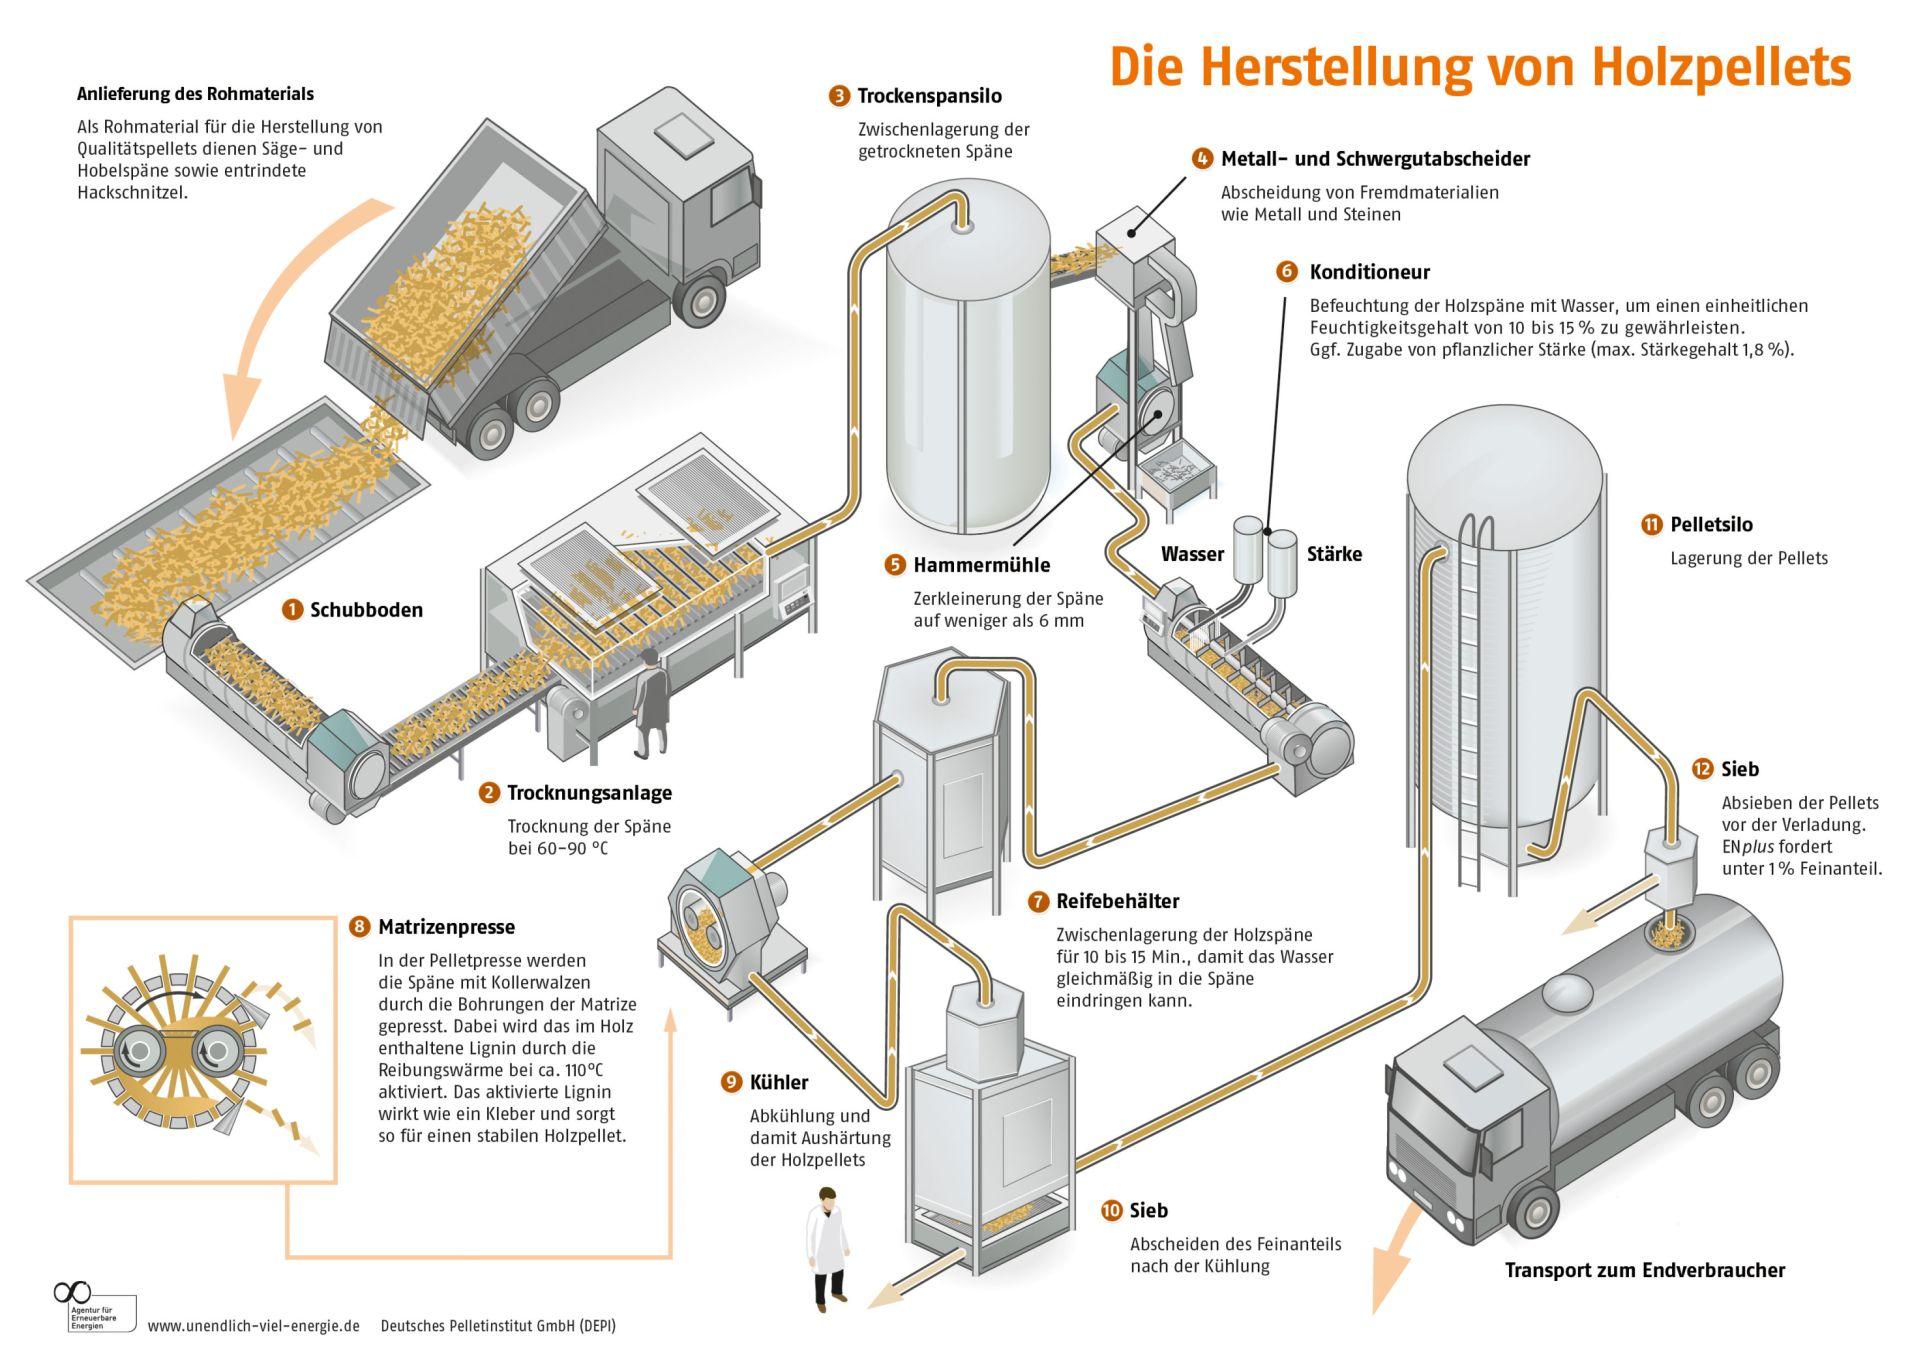 DEPI_Herstellung_Holzpellets_depilook_final